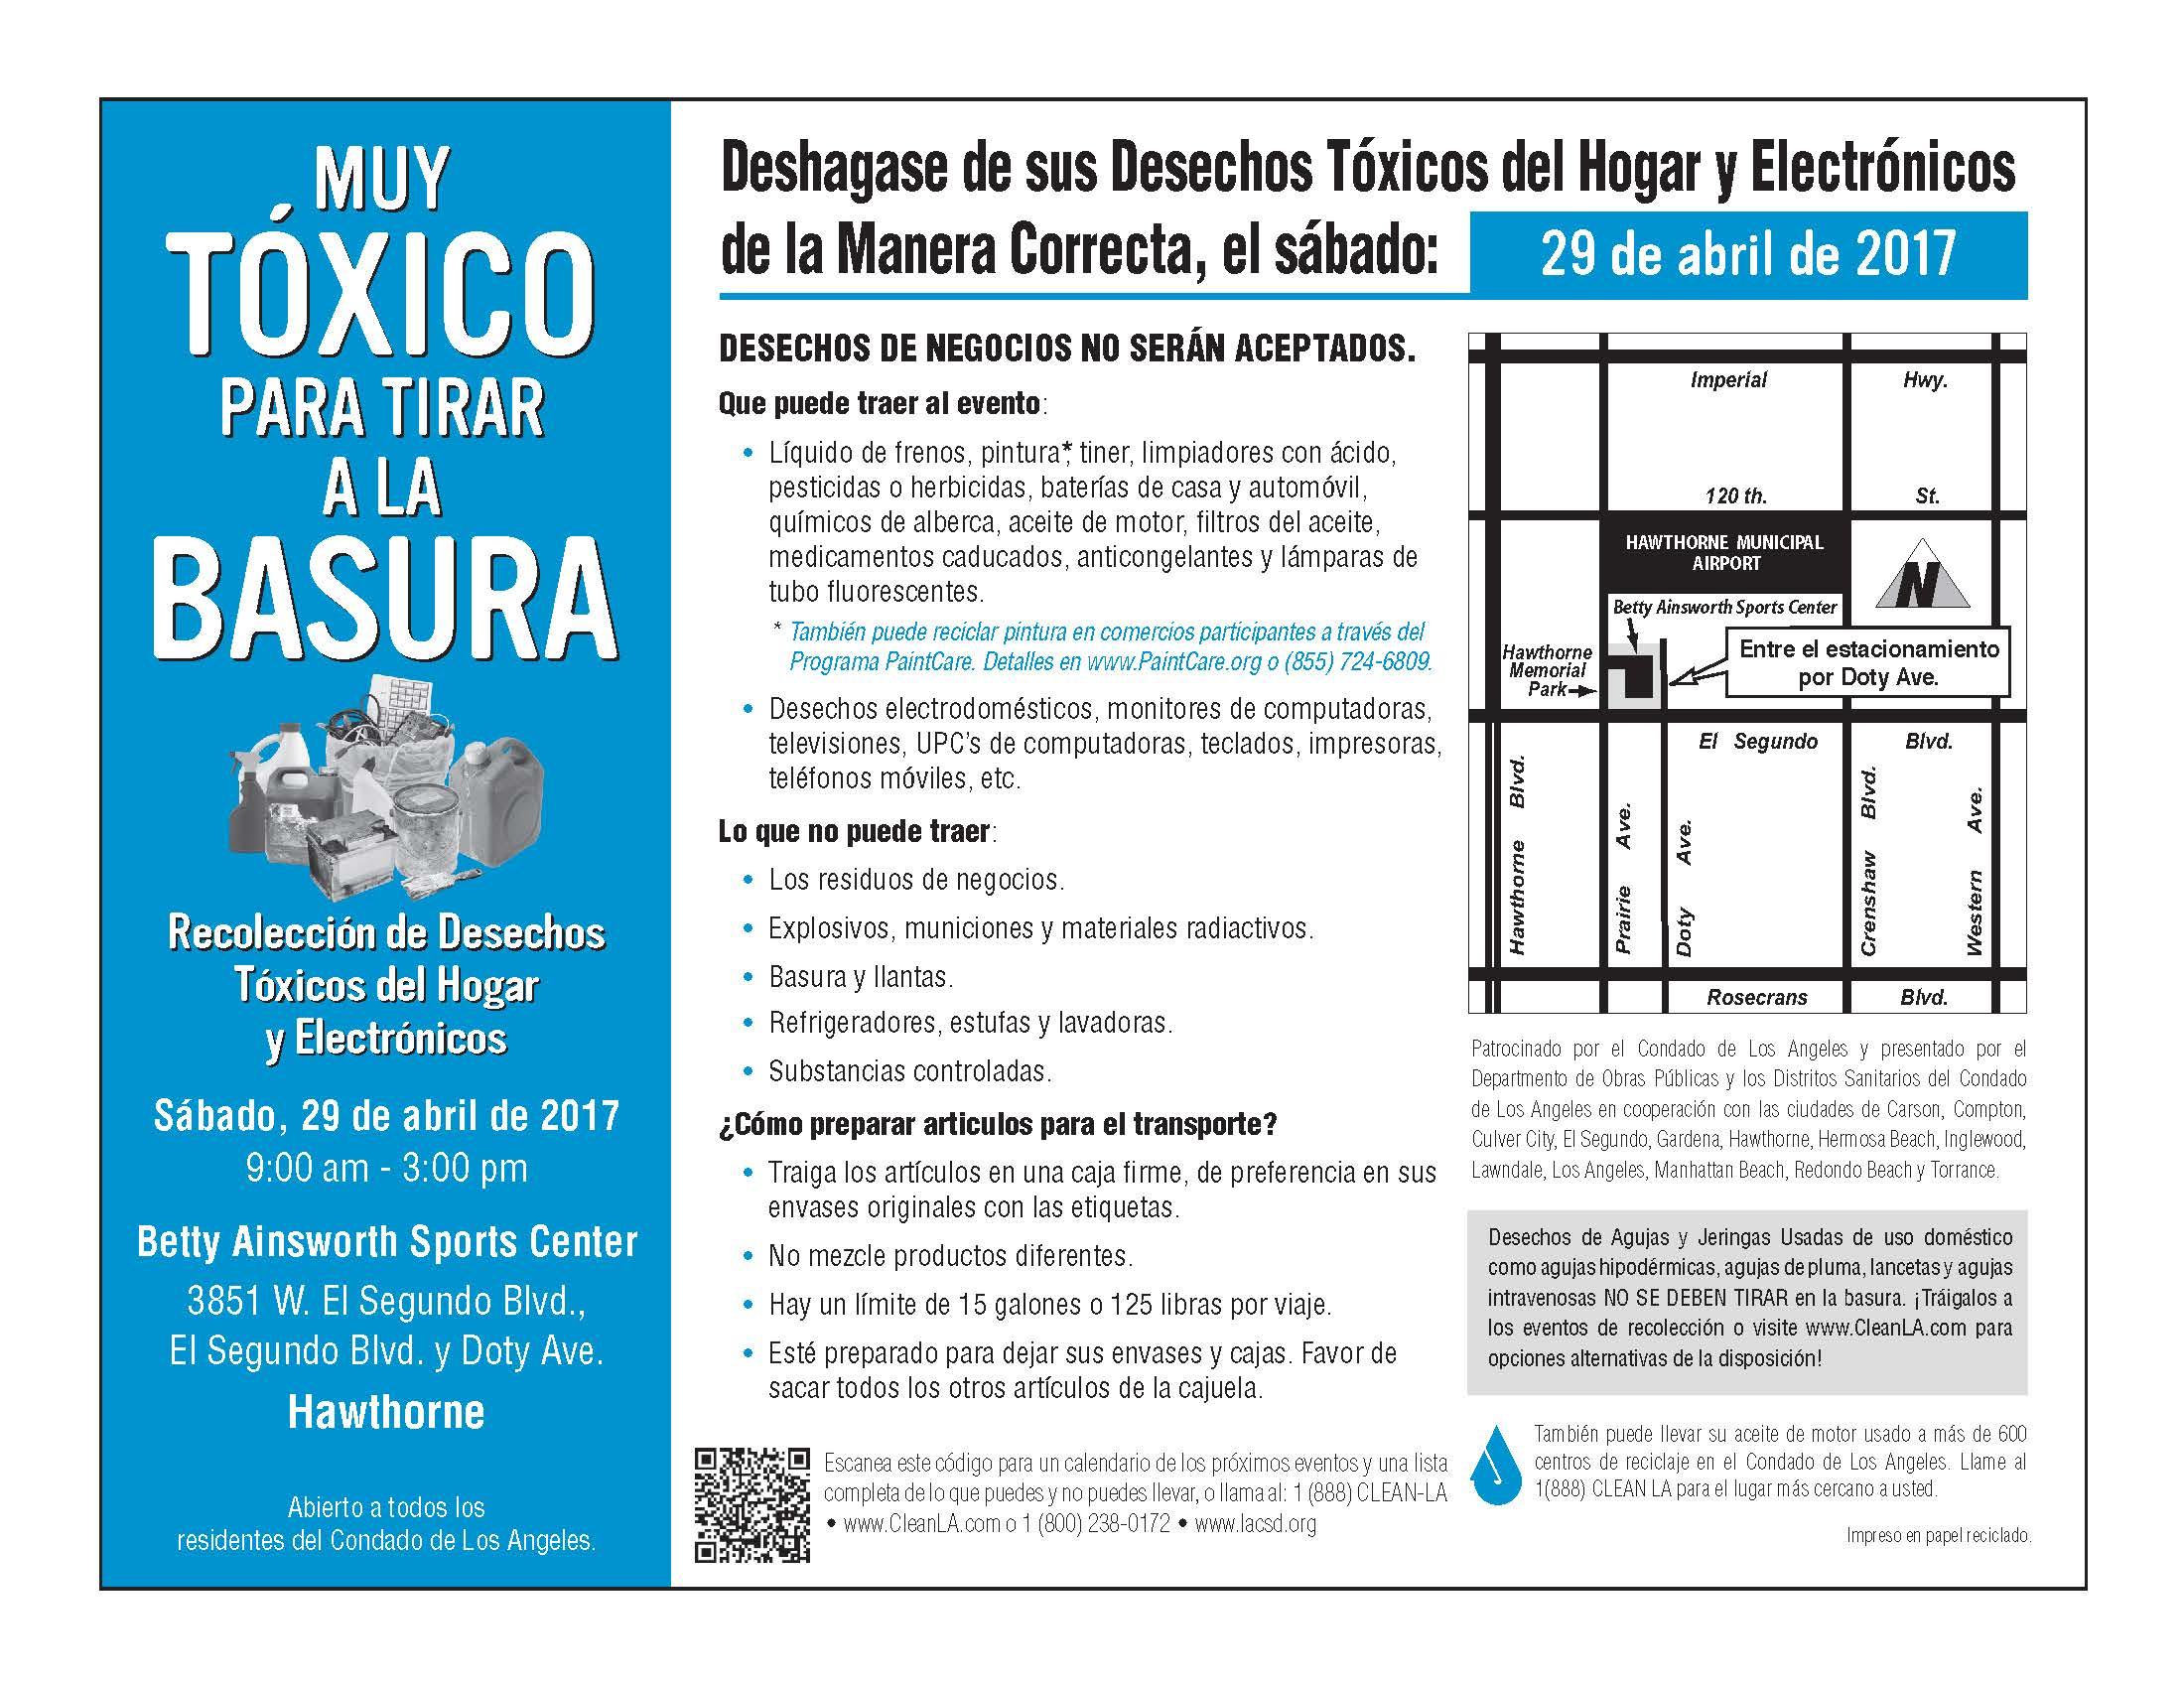 Hazardous Waste Spanish Flyer